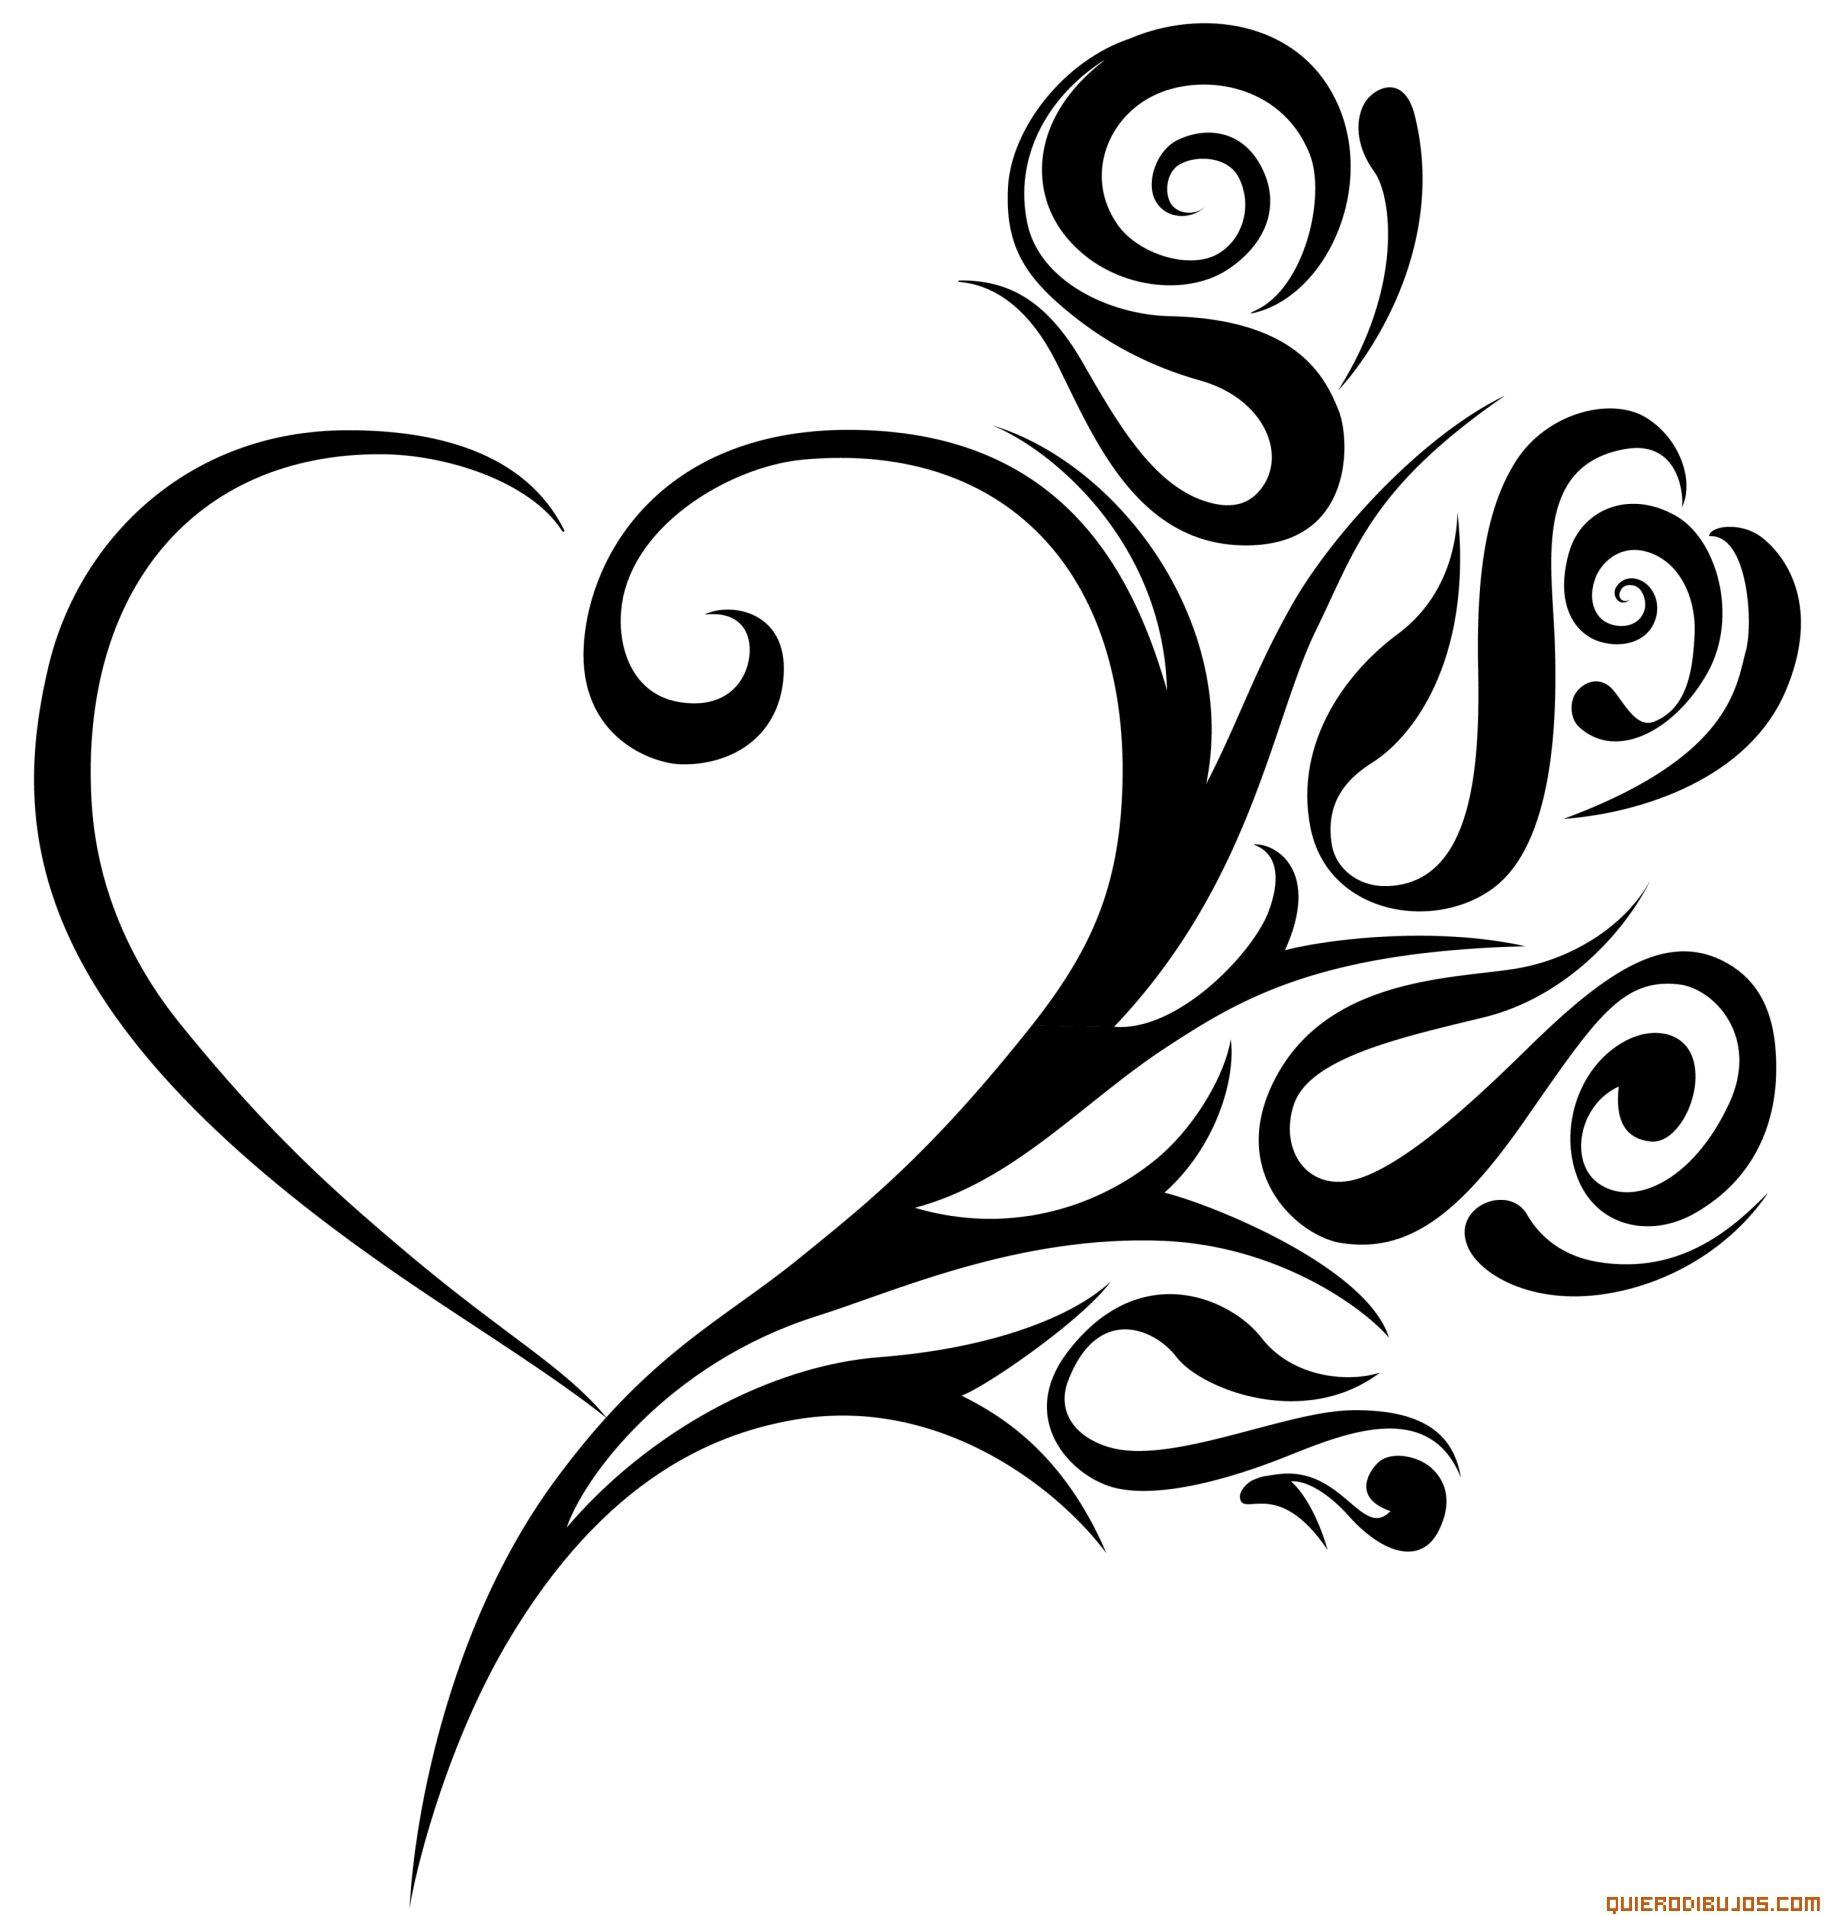 Tribal-Tattoos 68b6d42fa955c2df1102a7670554701e